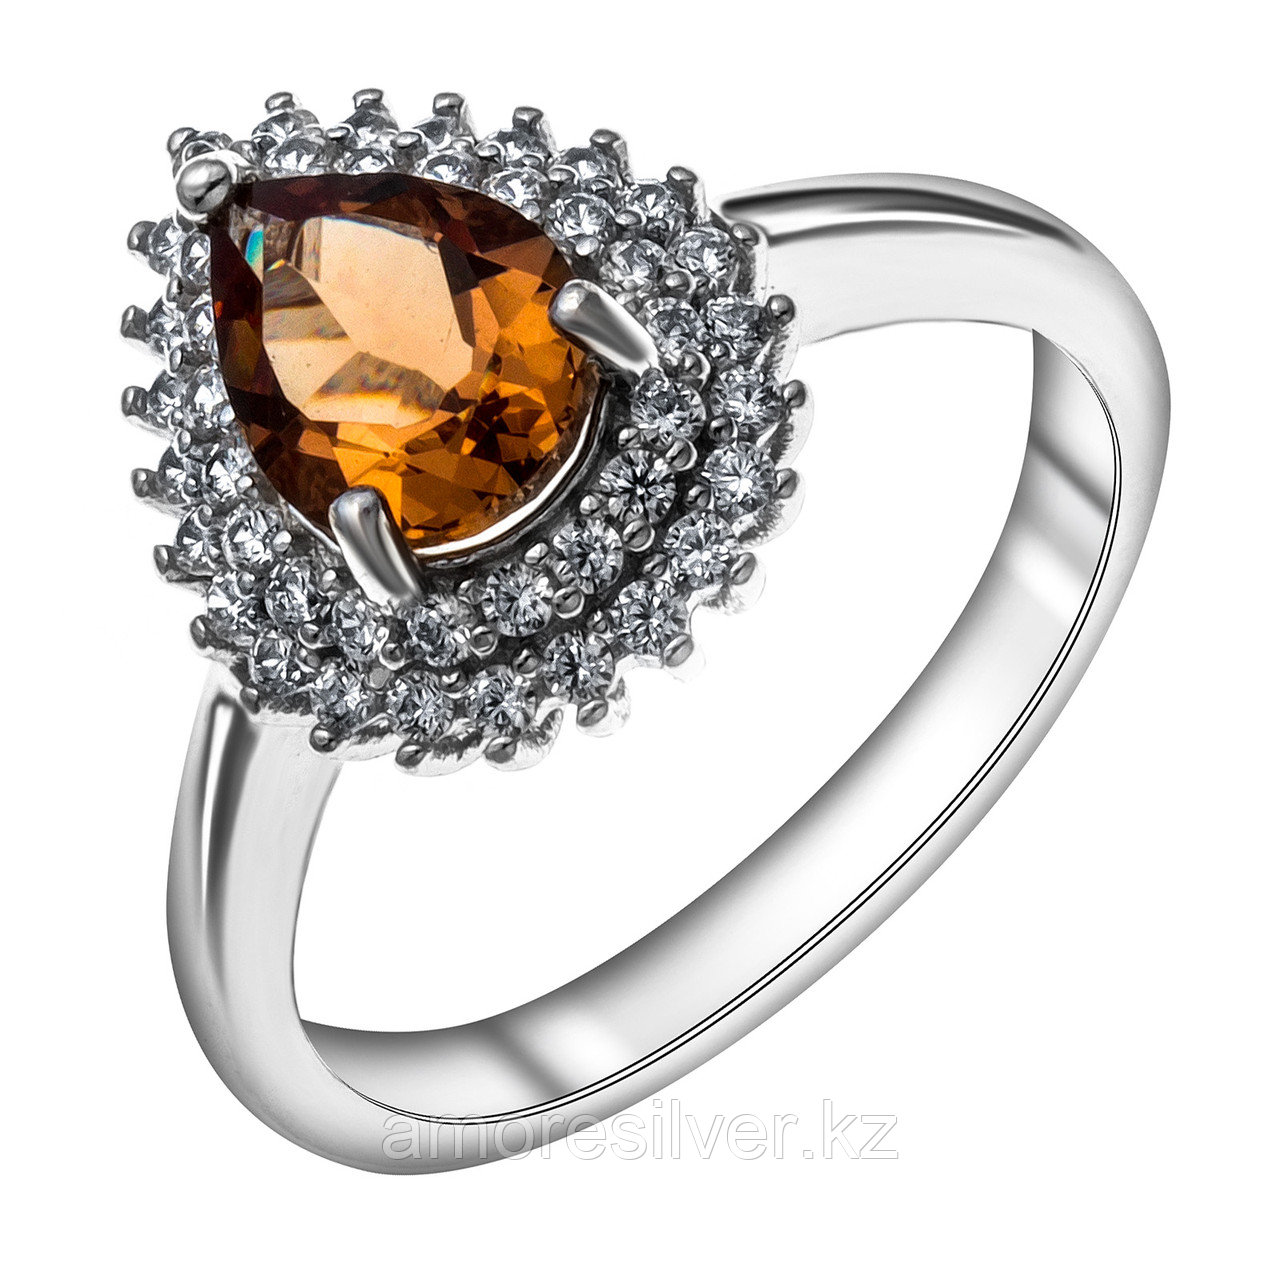 "Кольцо Teosa серебро с родием, ""halo"" R-DRGR00696-SU размеры - 17"